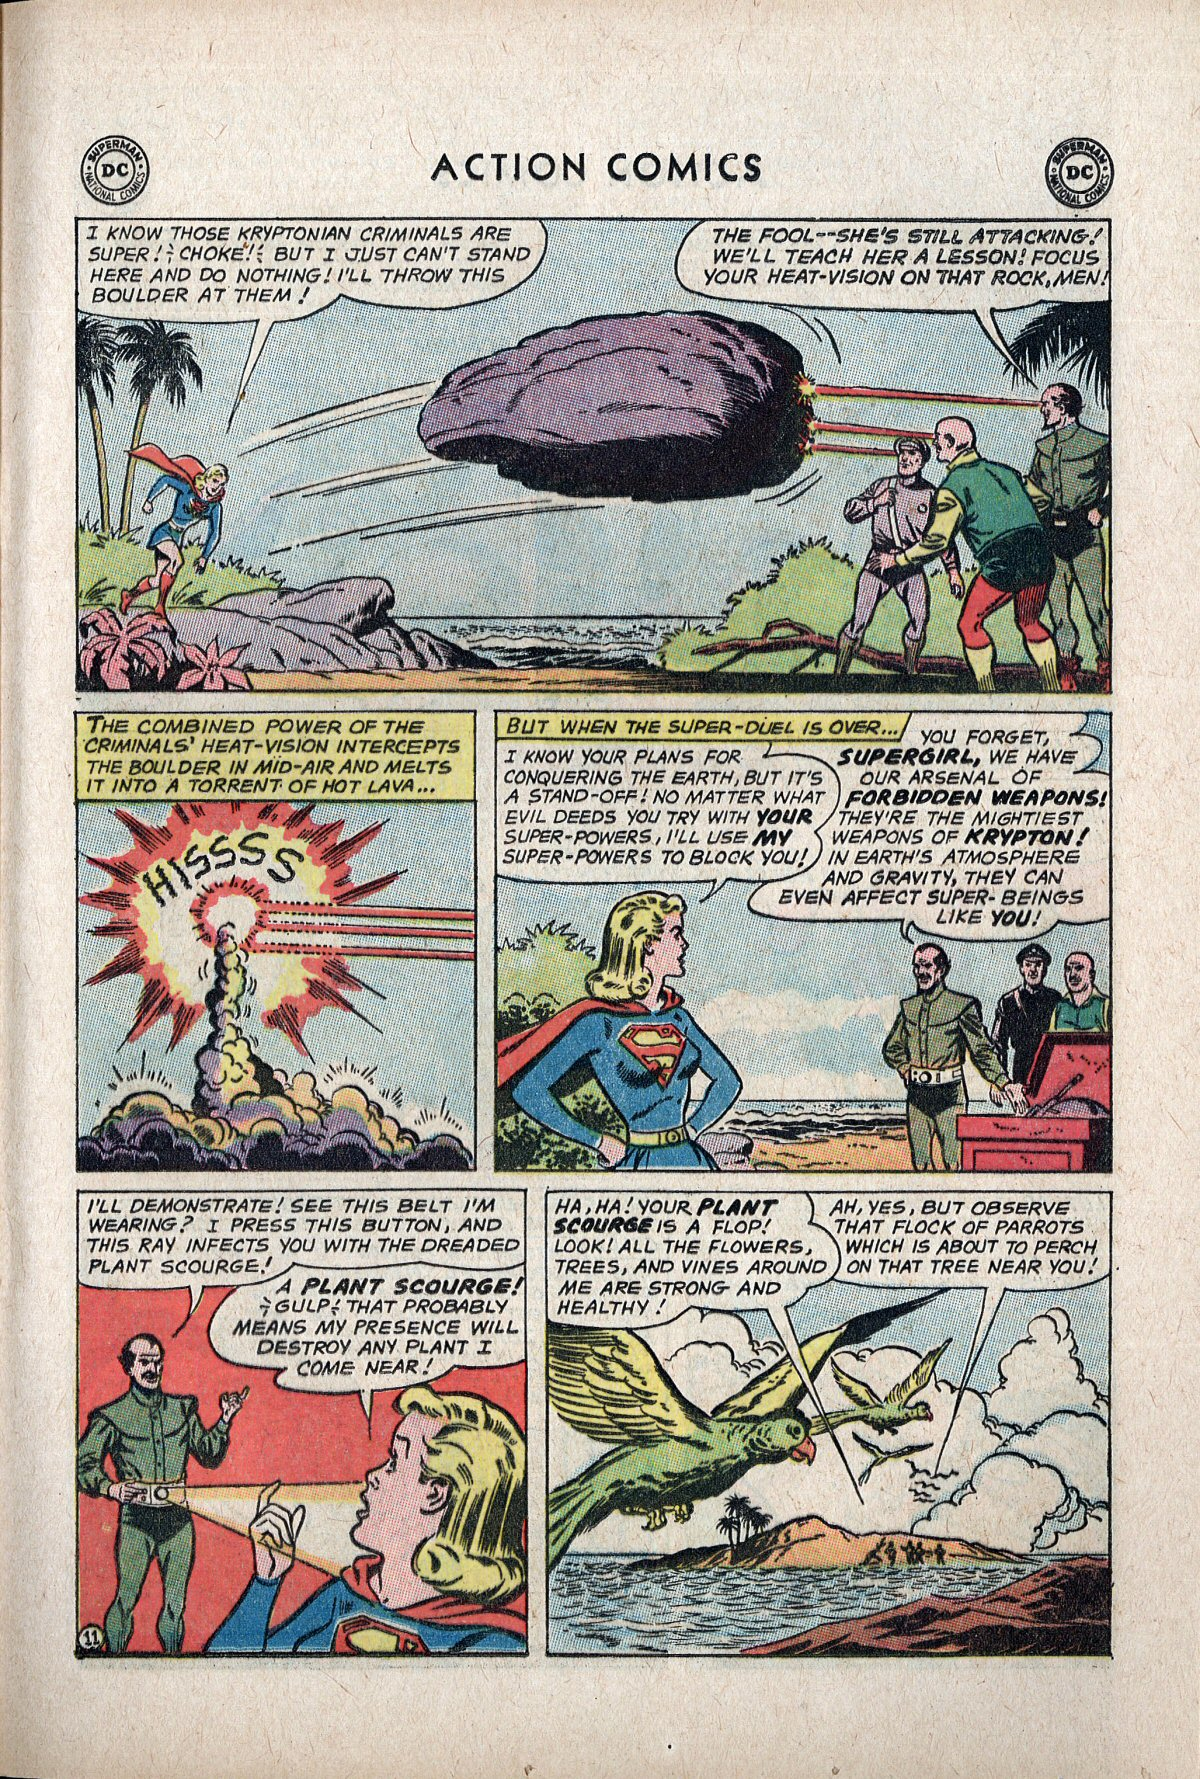 Action Comics (1938) 297 Page 28